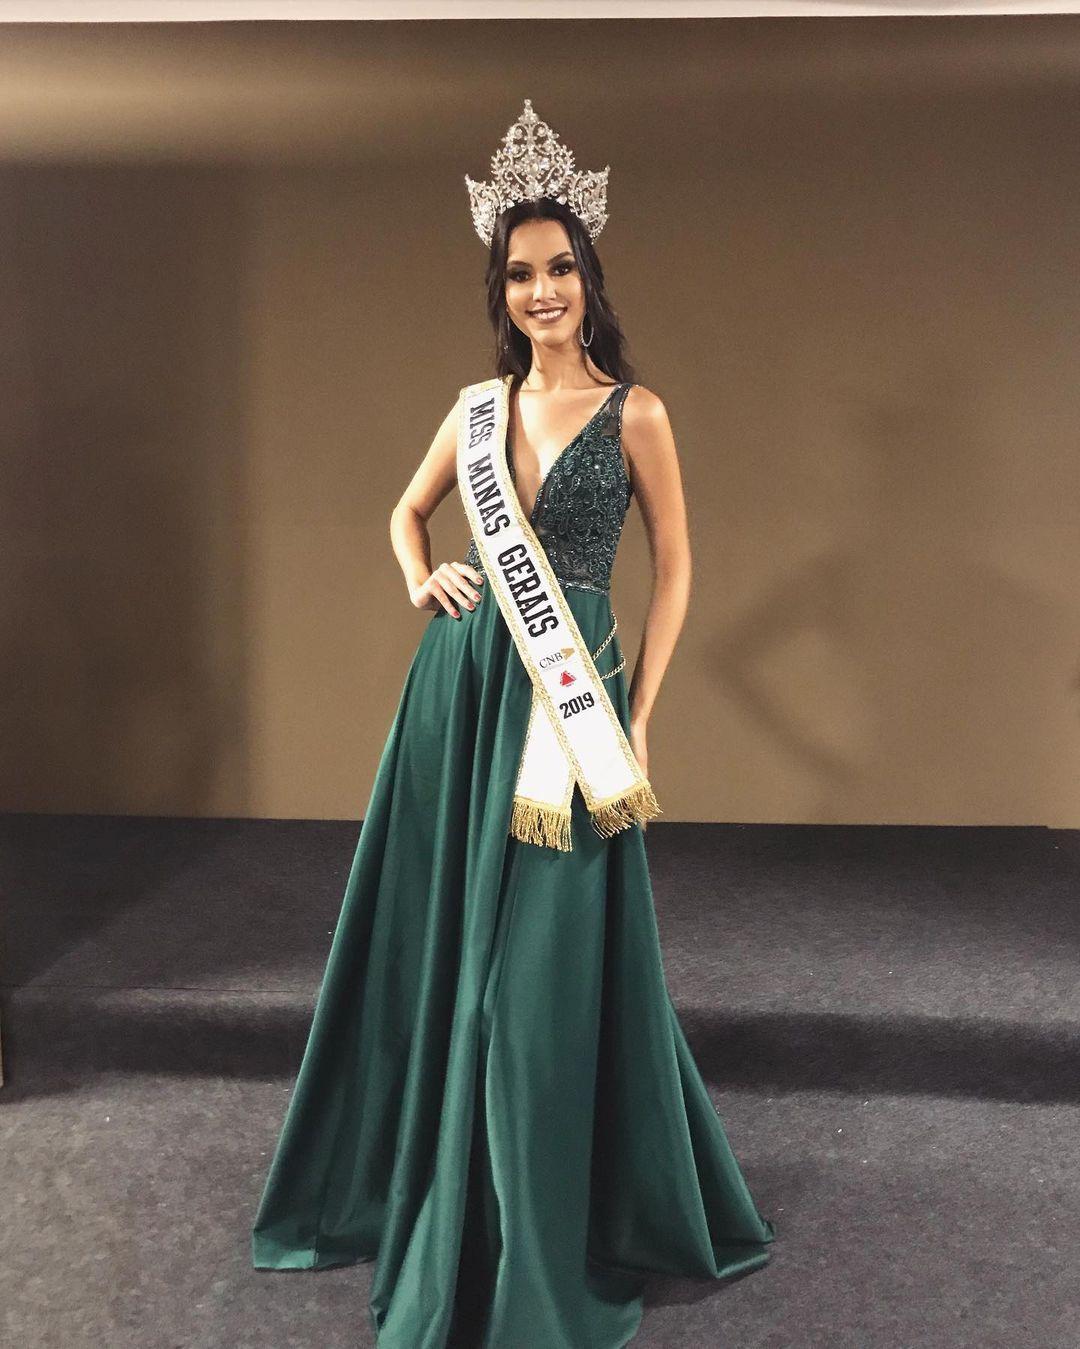 rafaella felipe, top 20 de miss brasil mundo 2019. - Página 10 60550910